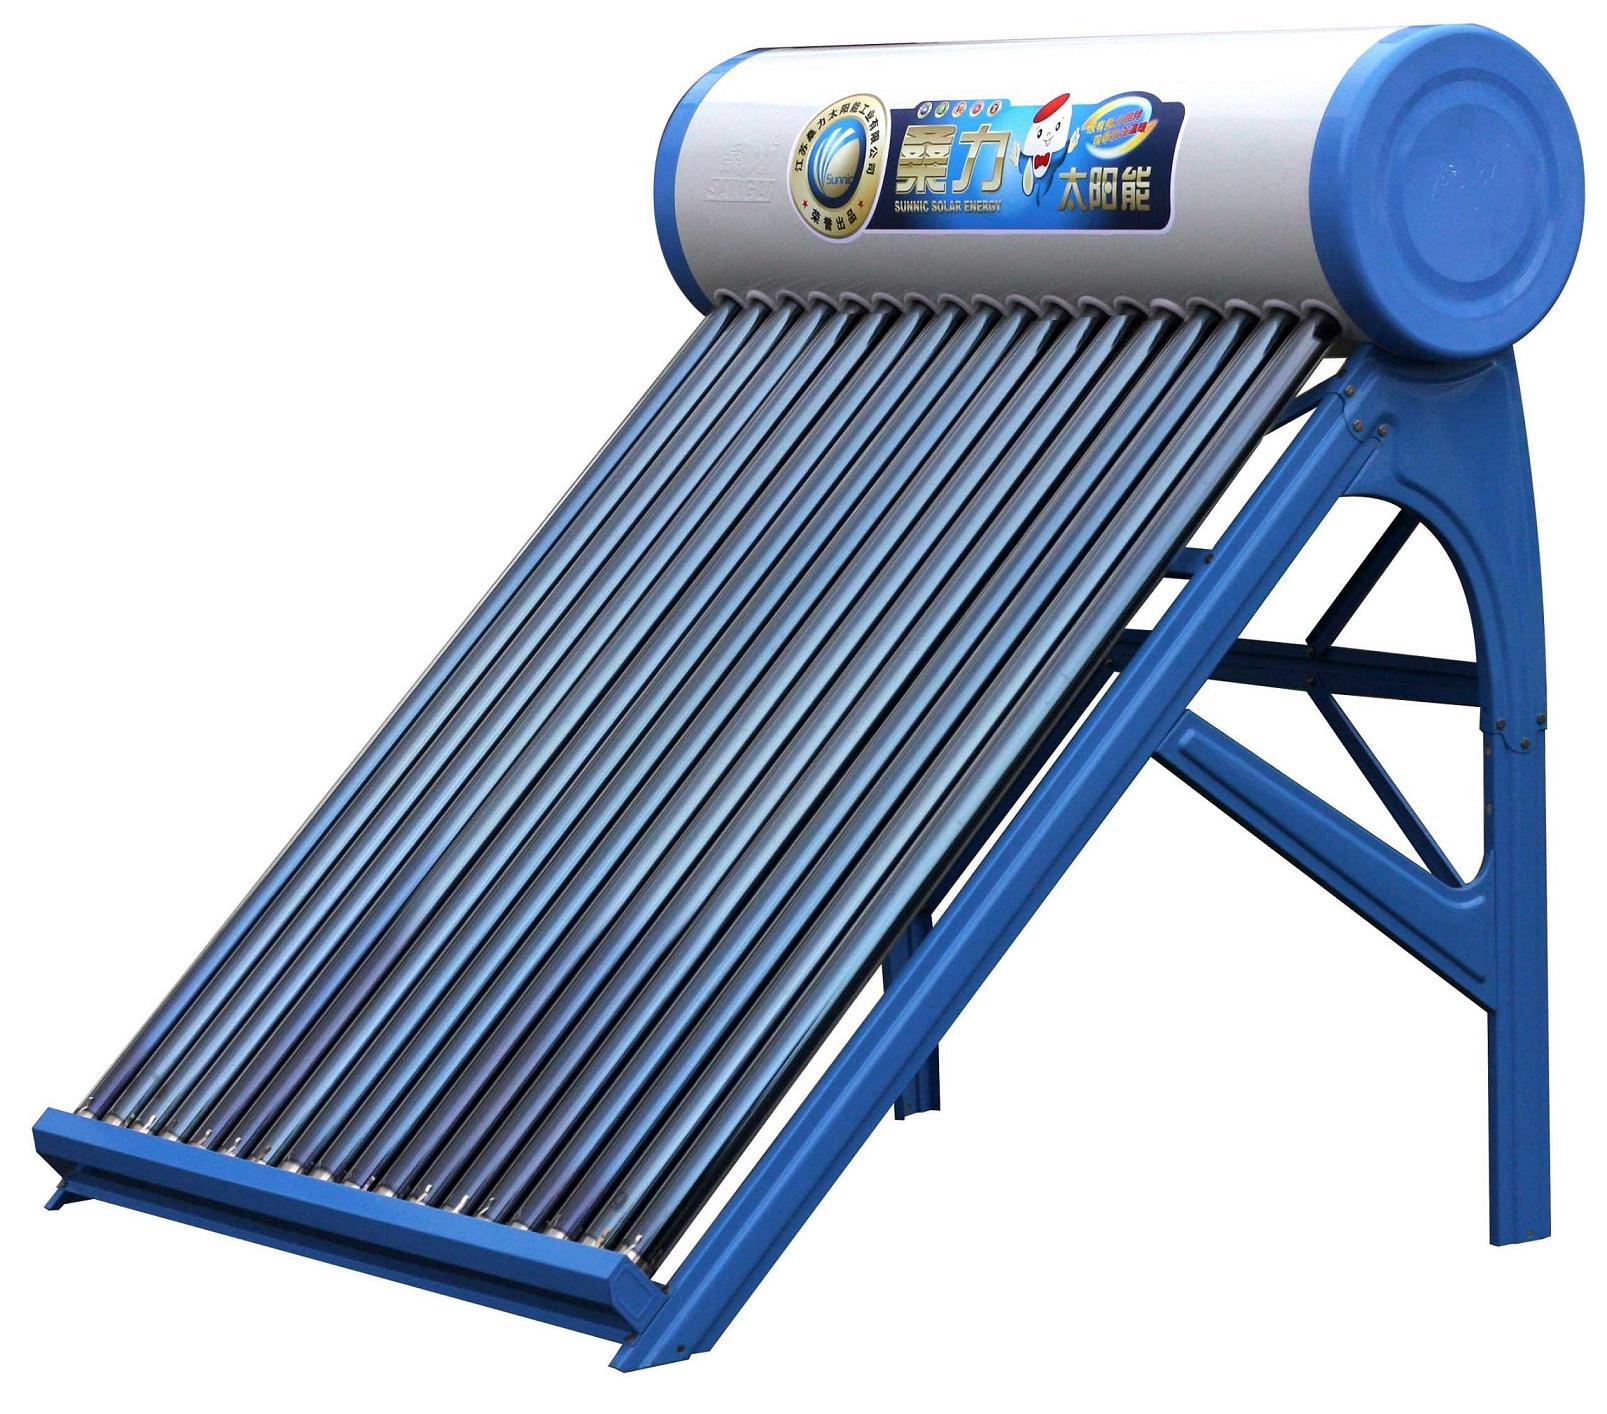 Solar Water Heater Pool.